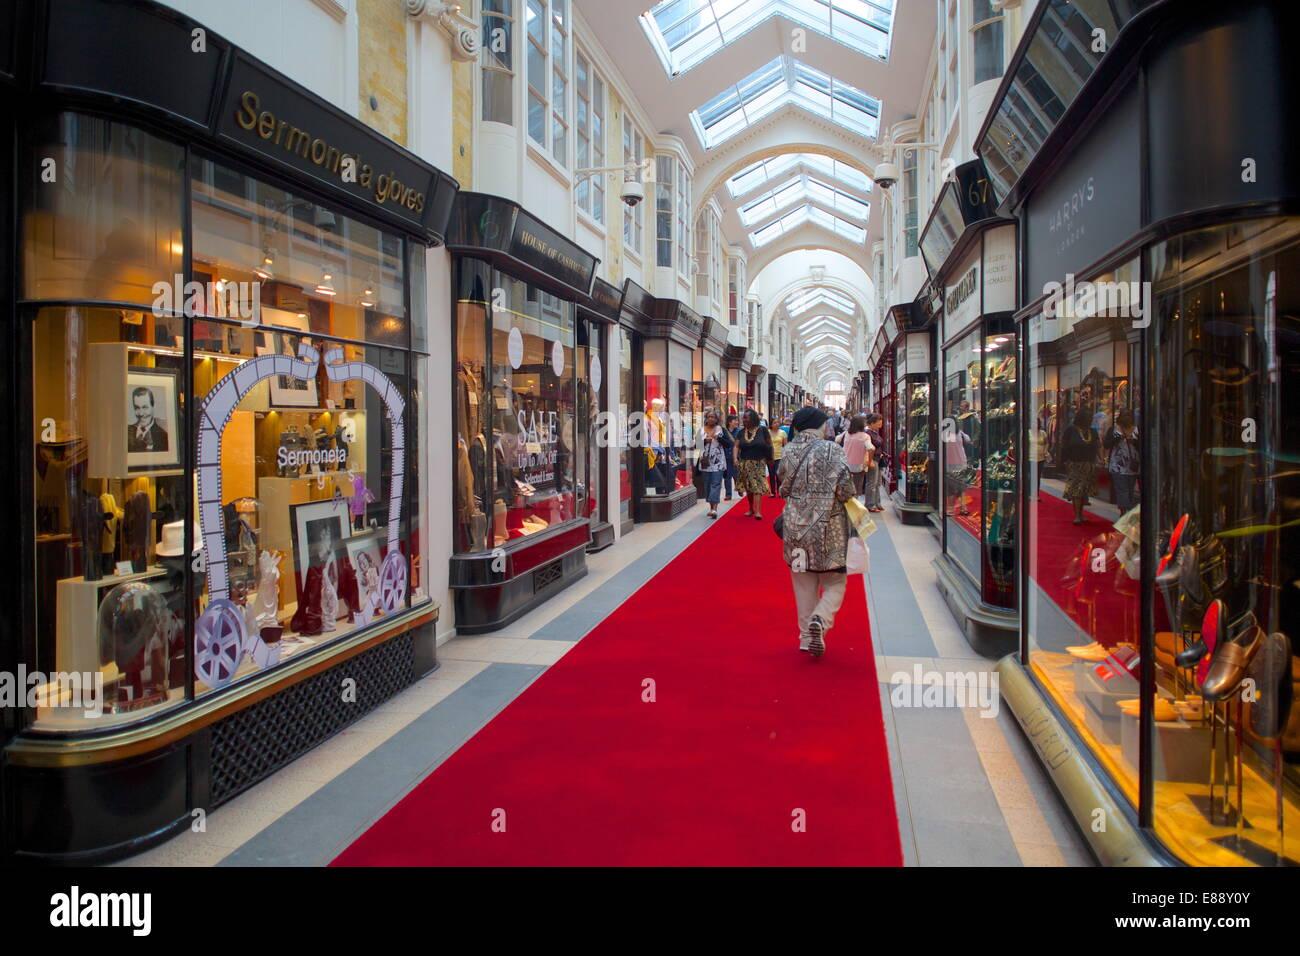 Burlington Arcade, London, England, United Kingdom, Europe - Stock Image